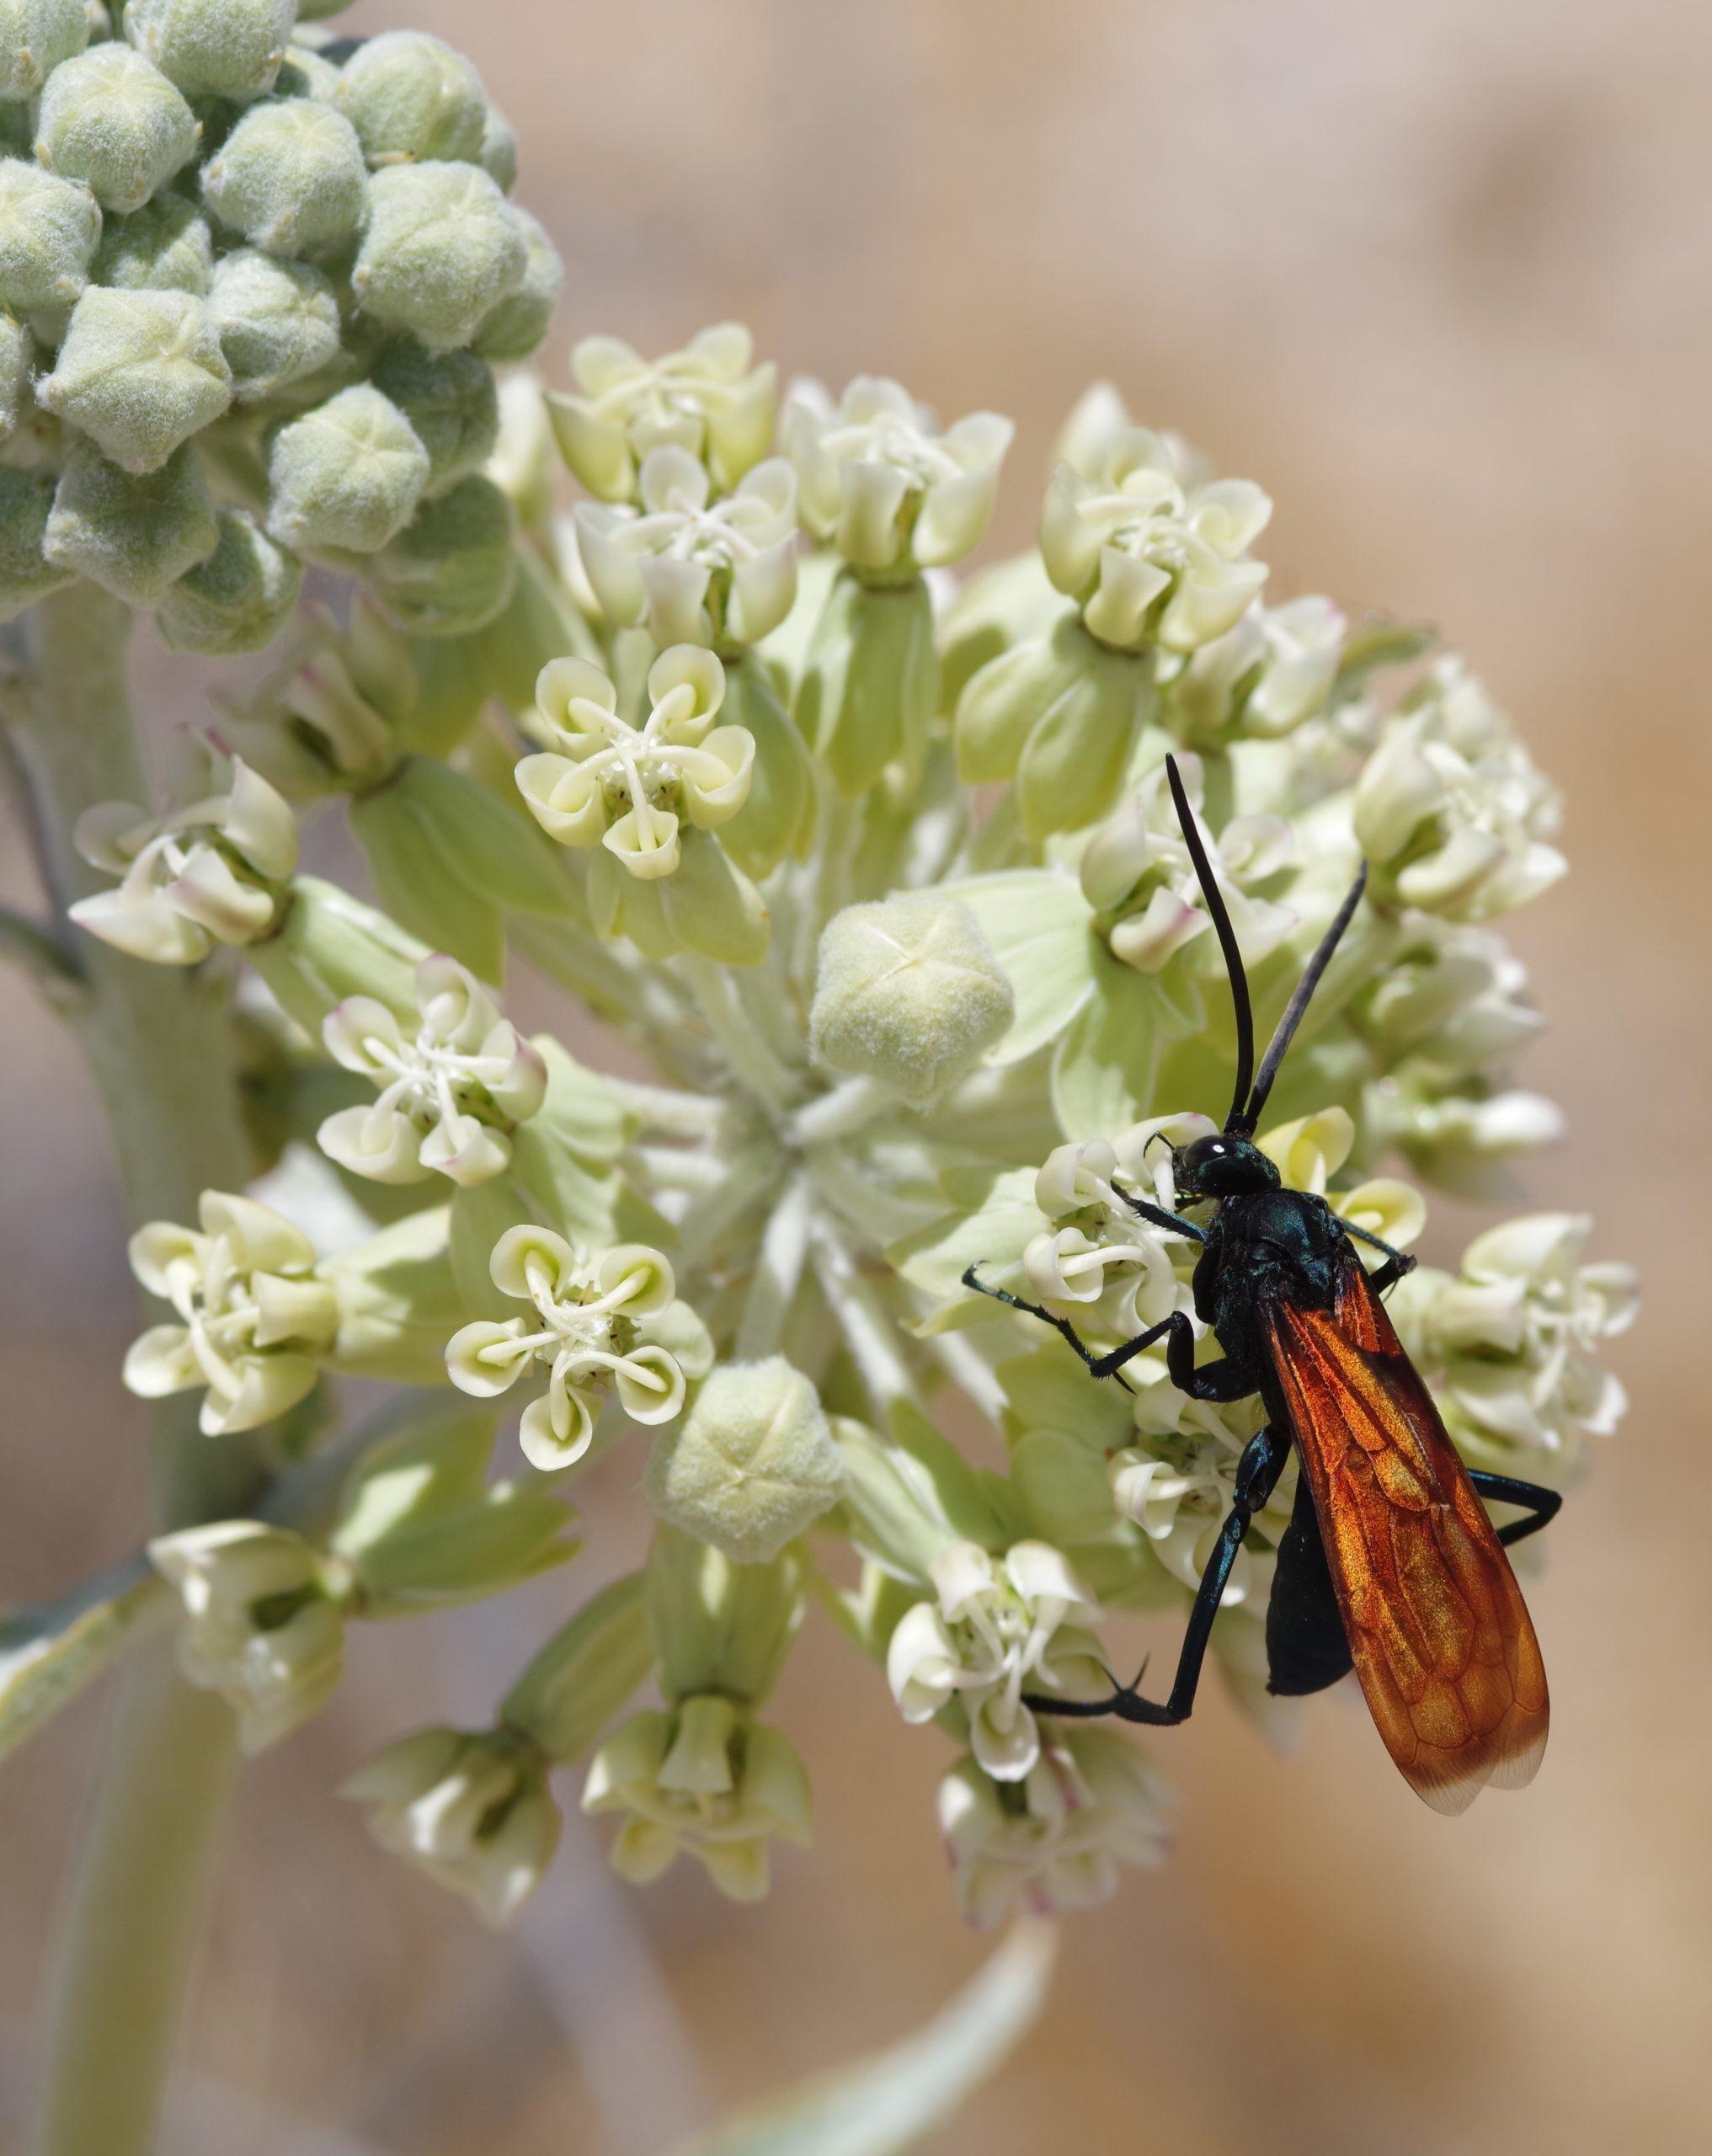 THISBE'S TARANTULA-HAWK WASP, Pepsis thisbe. Photo by Paul De Ley.